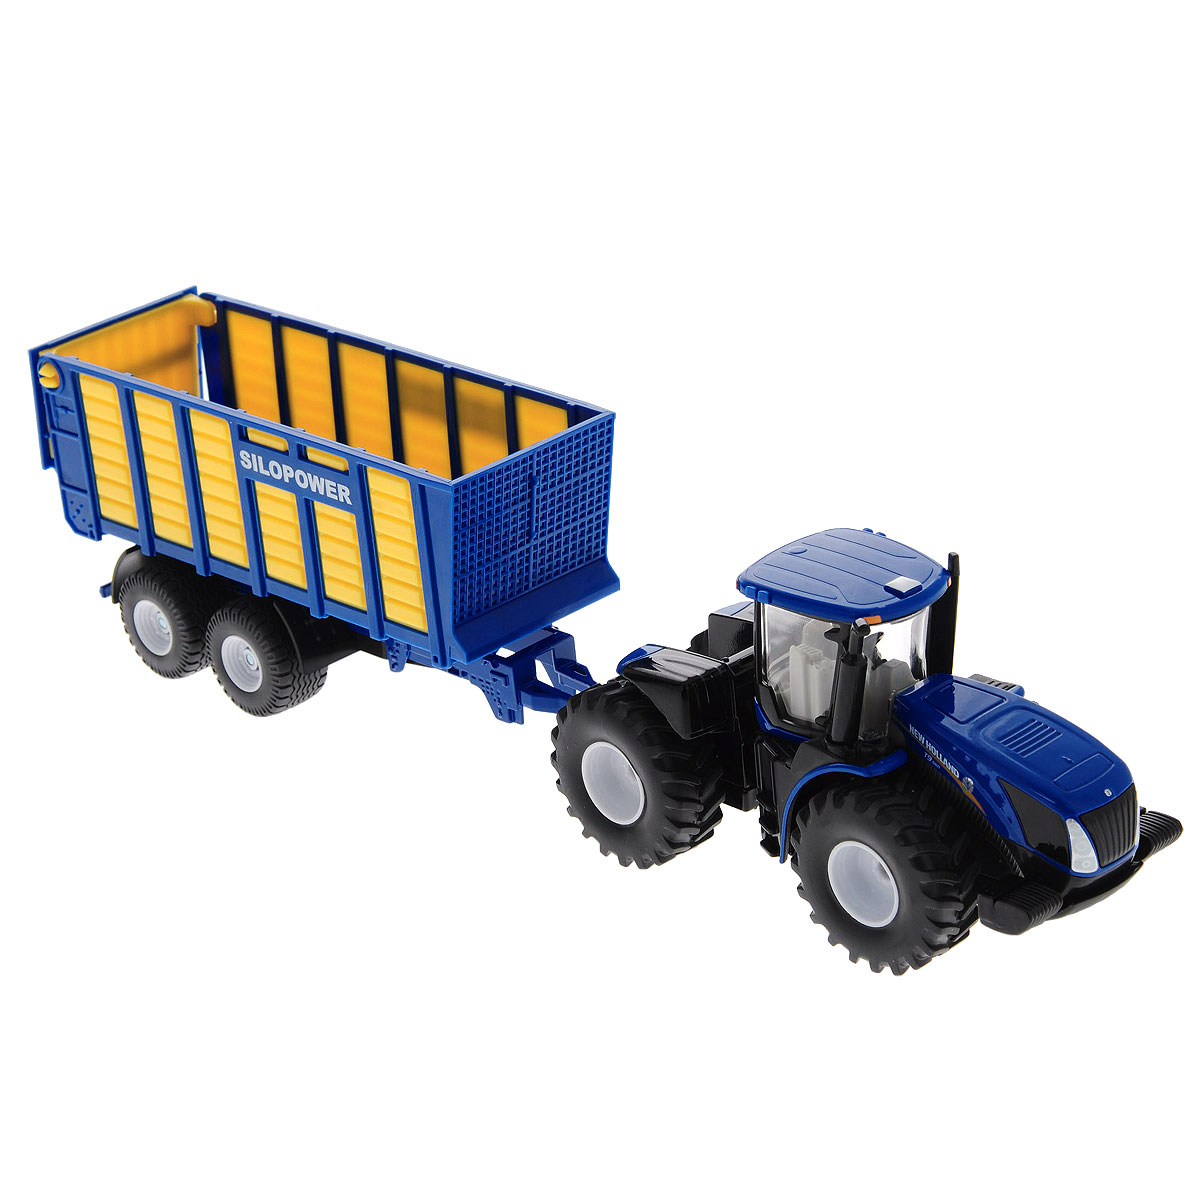 Siku Трактор New Holland T с прицепом siku трактор new holland t7070 с опрыскивателем kverneland